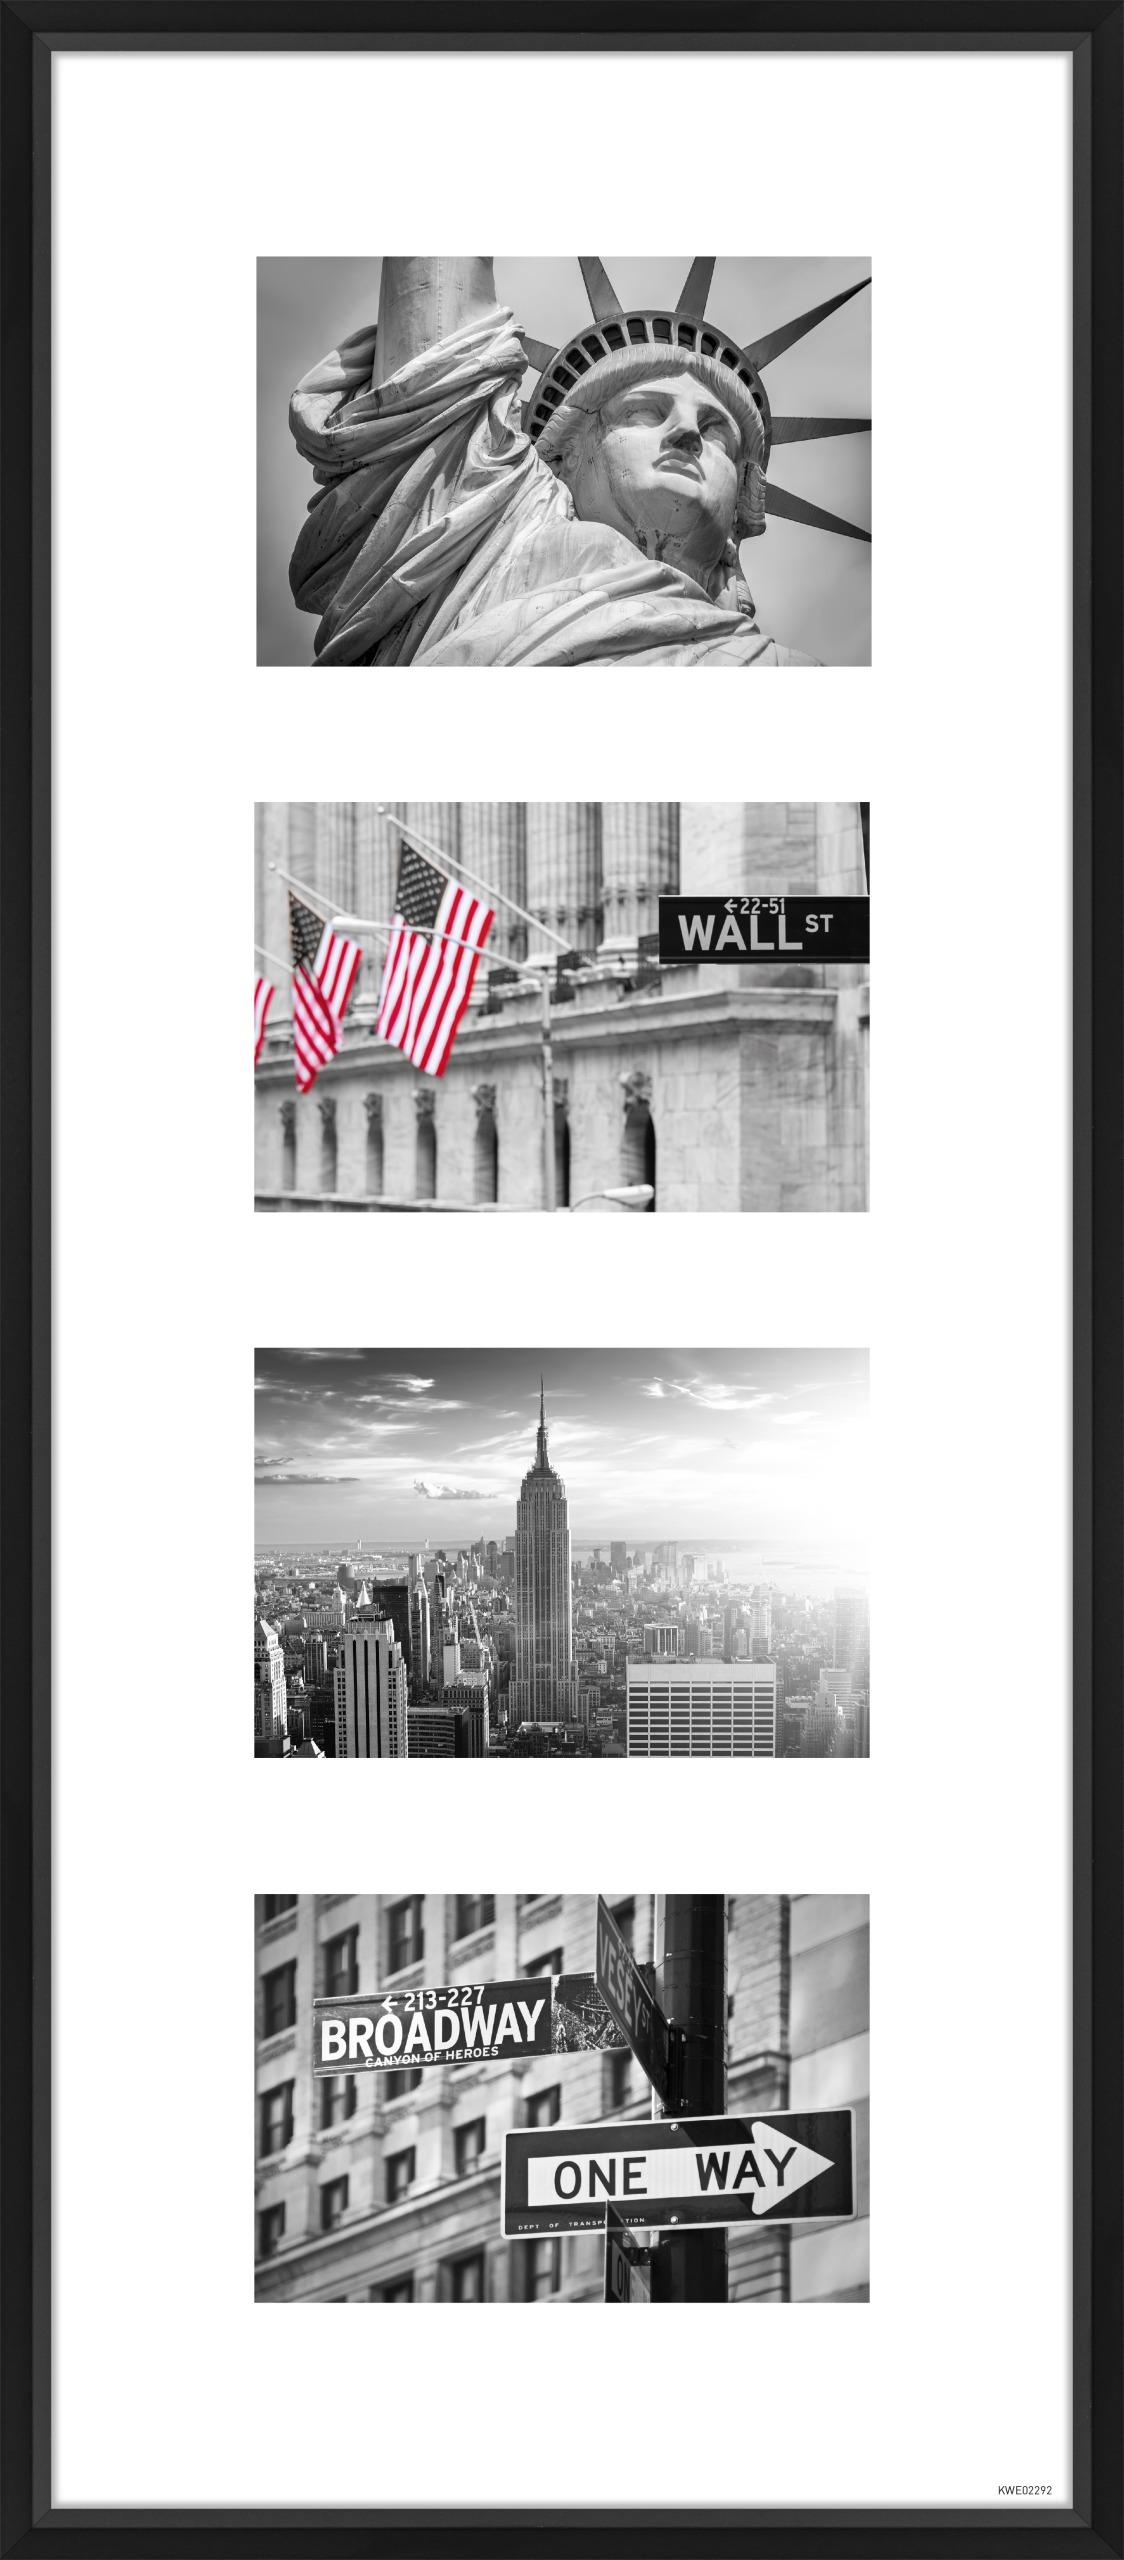 Broadway Fotorahmen 13x18 cm schwarz